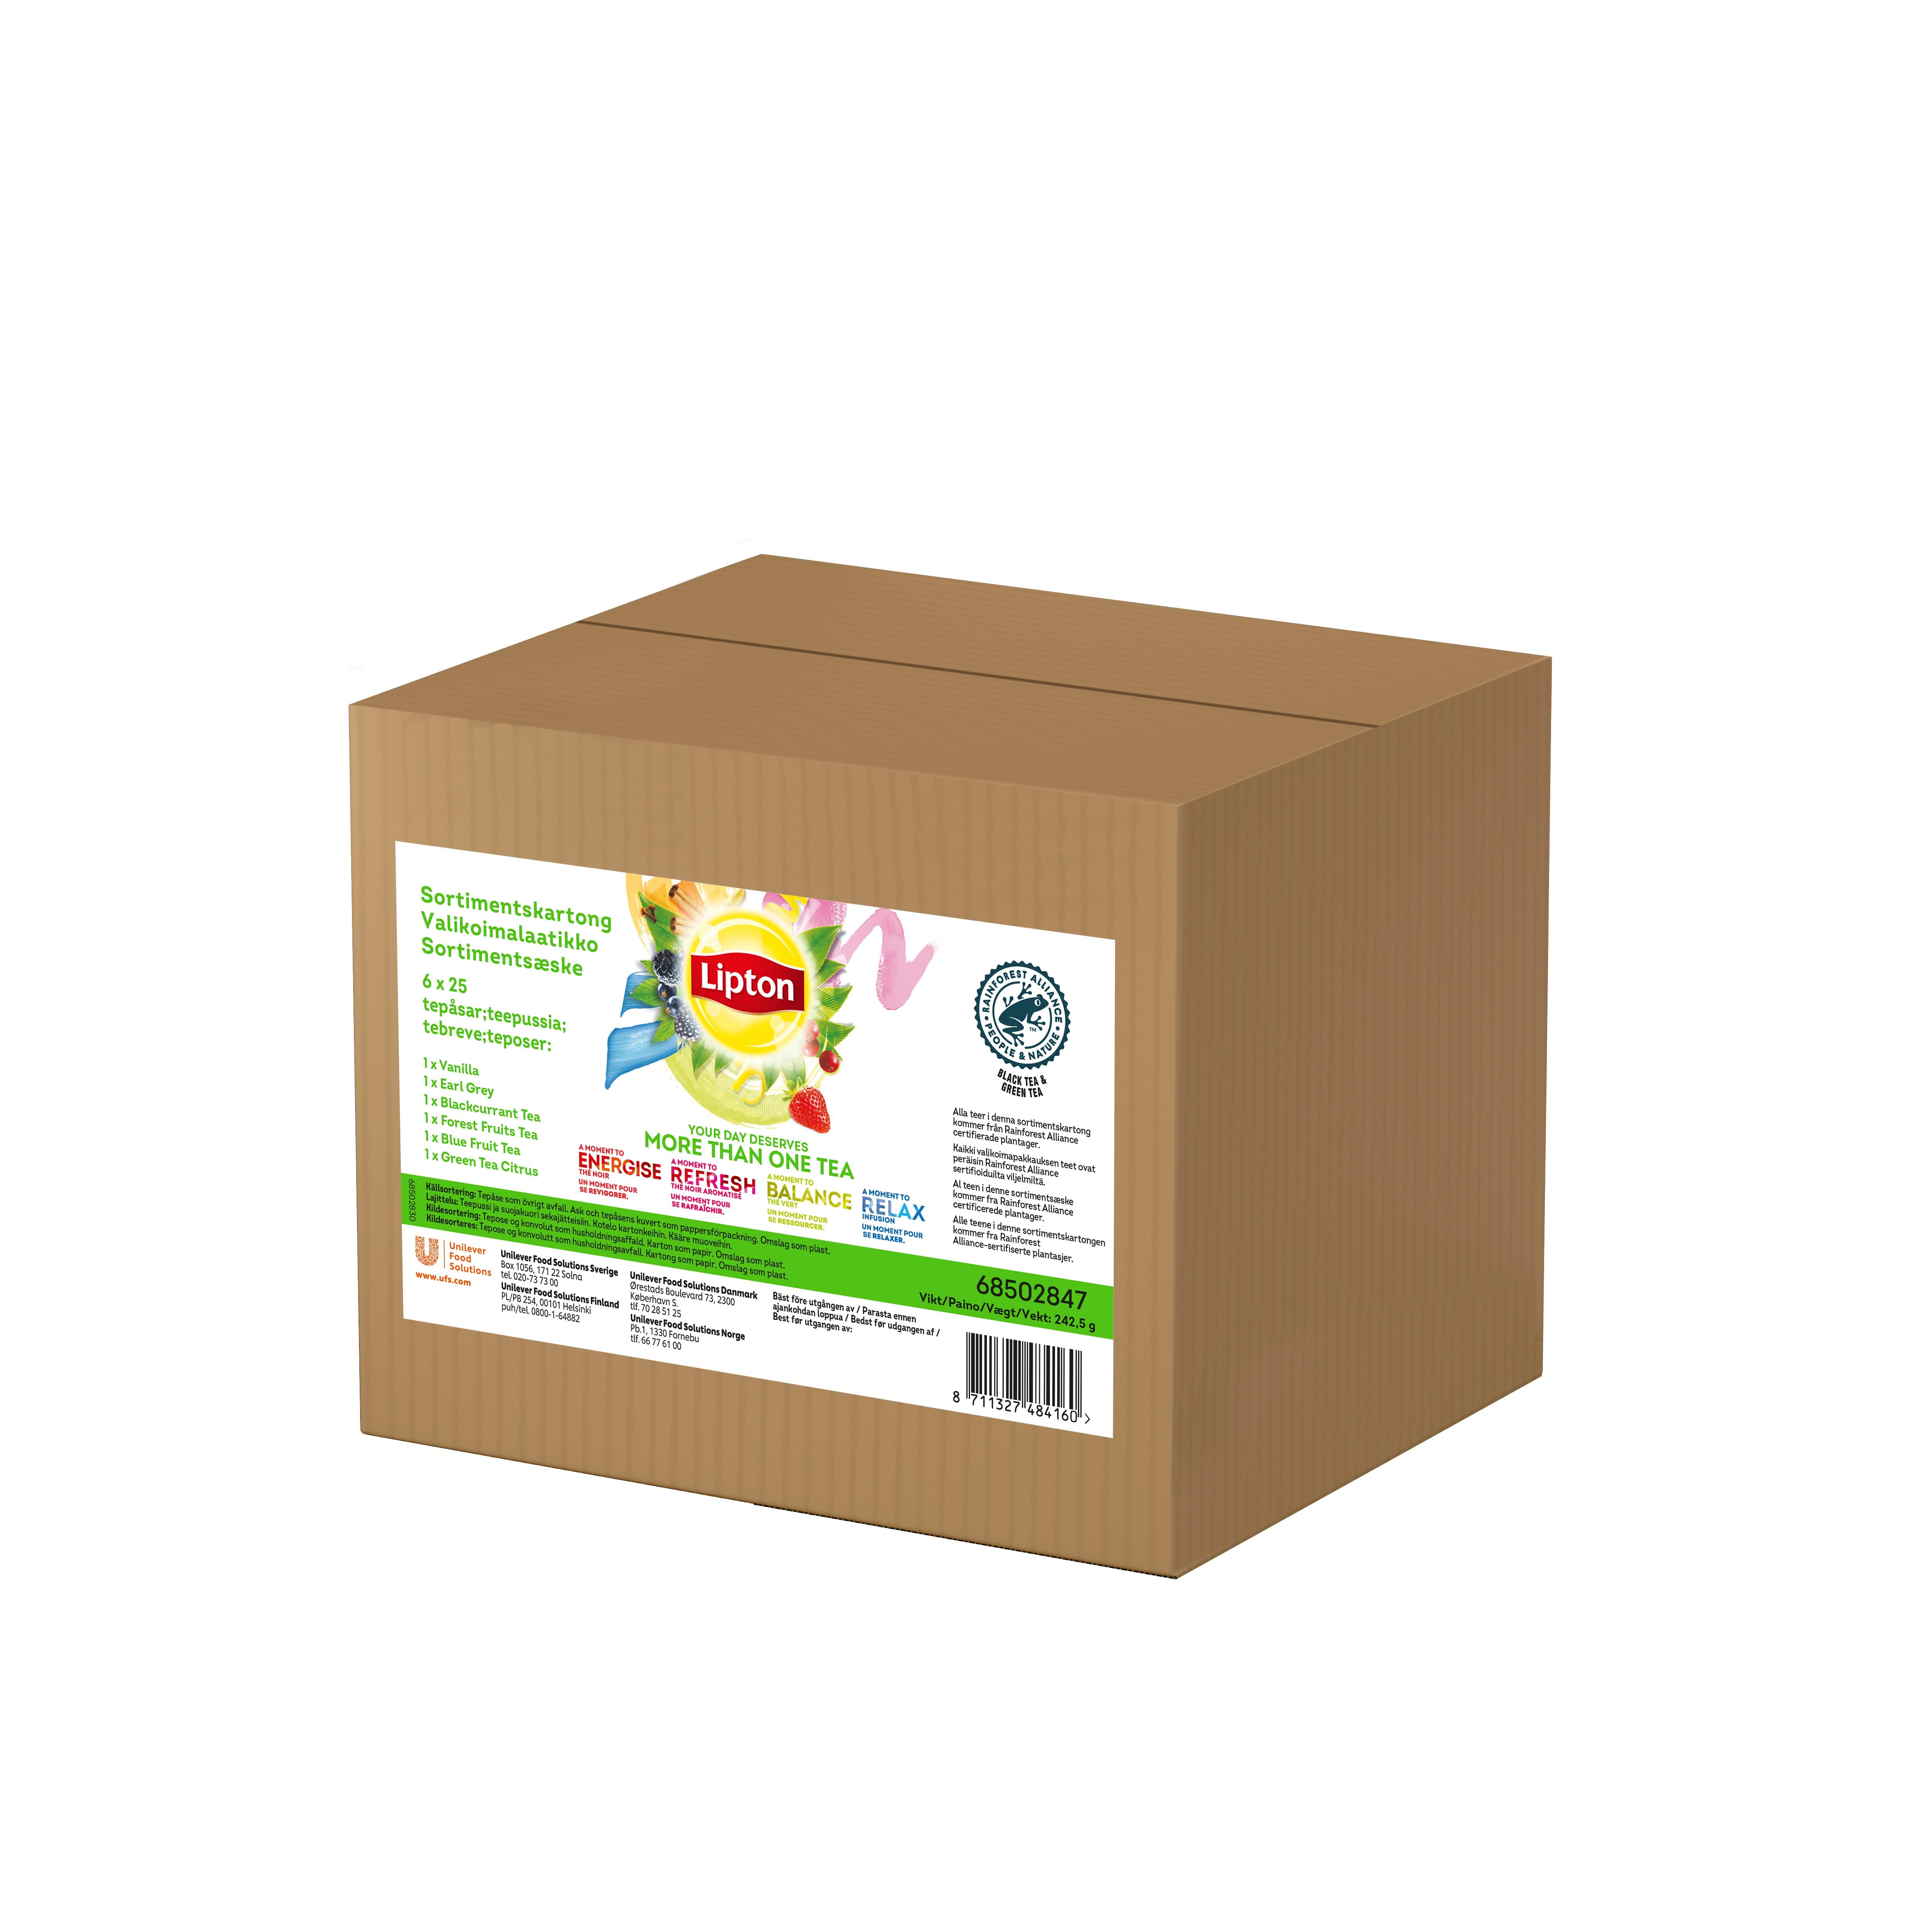 Lipton Classic Te Rainforest Alliance Certifierad Sortimentskartong 6 x 25 påsar -